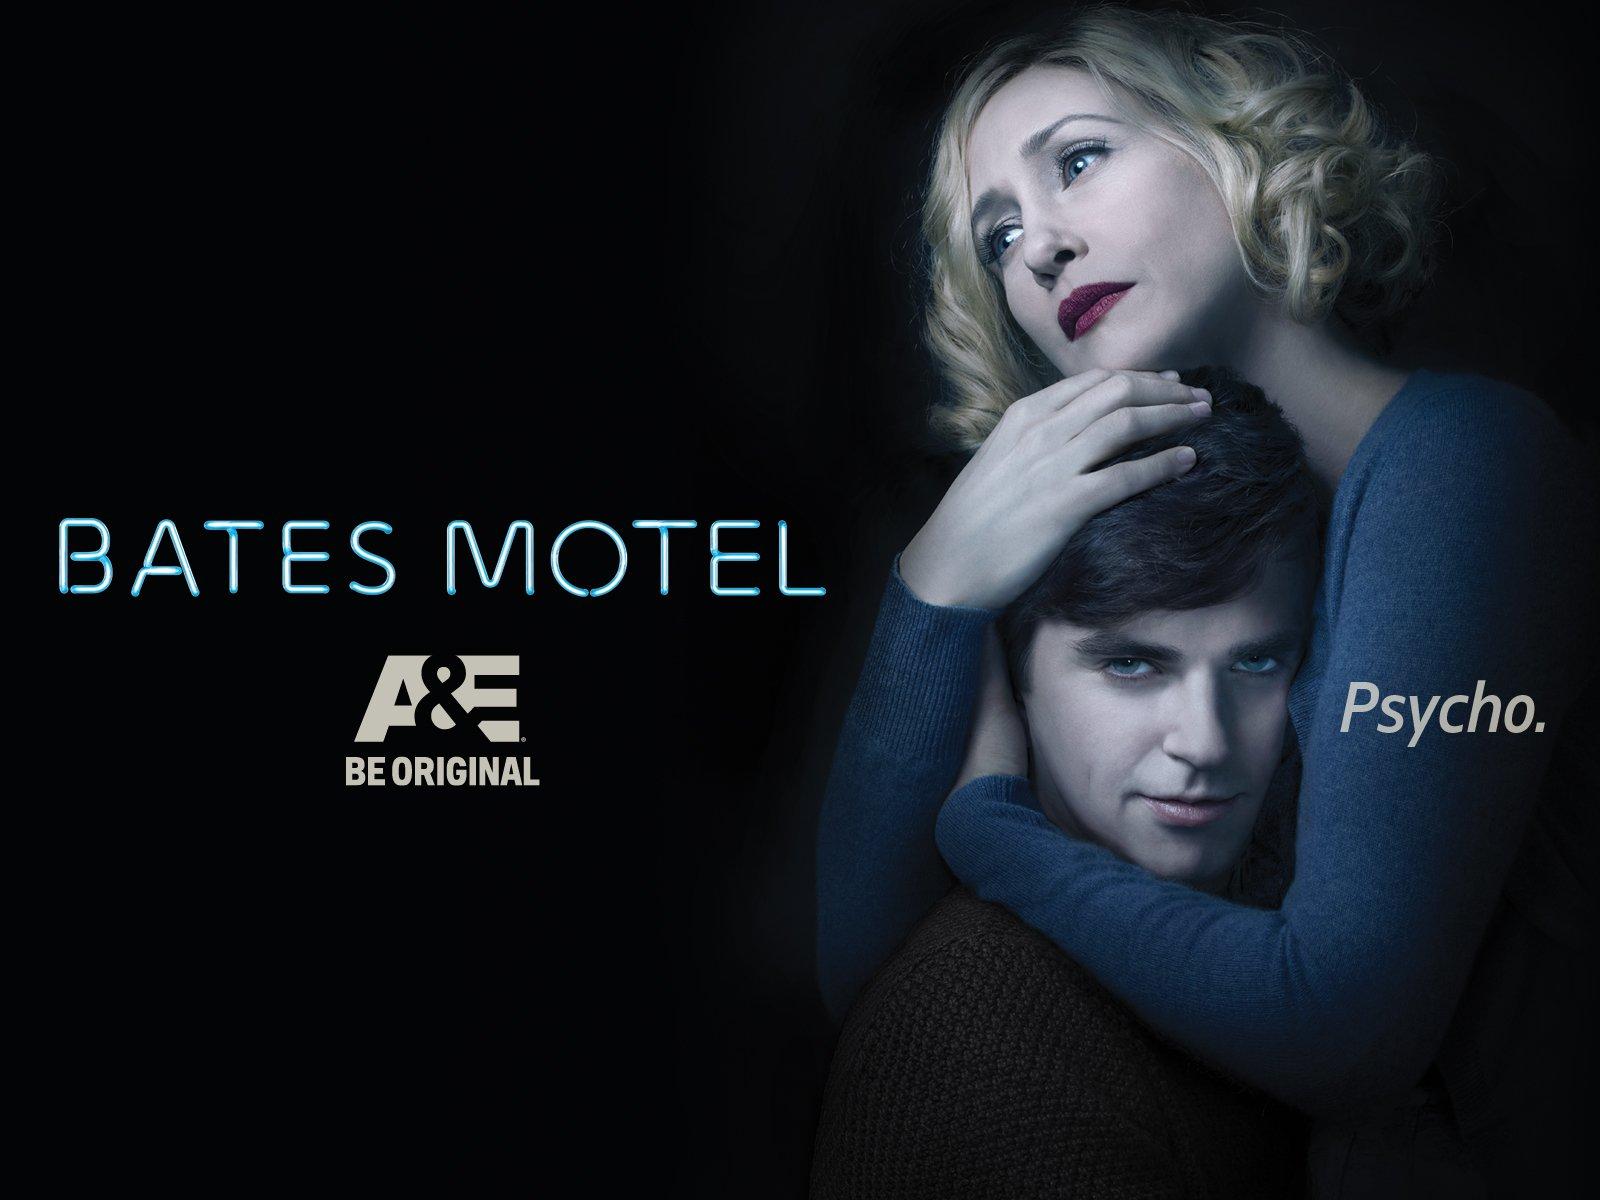 Bates motel capitulo 1 subtitulado online dating